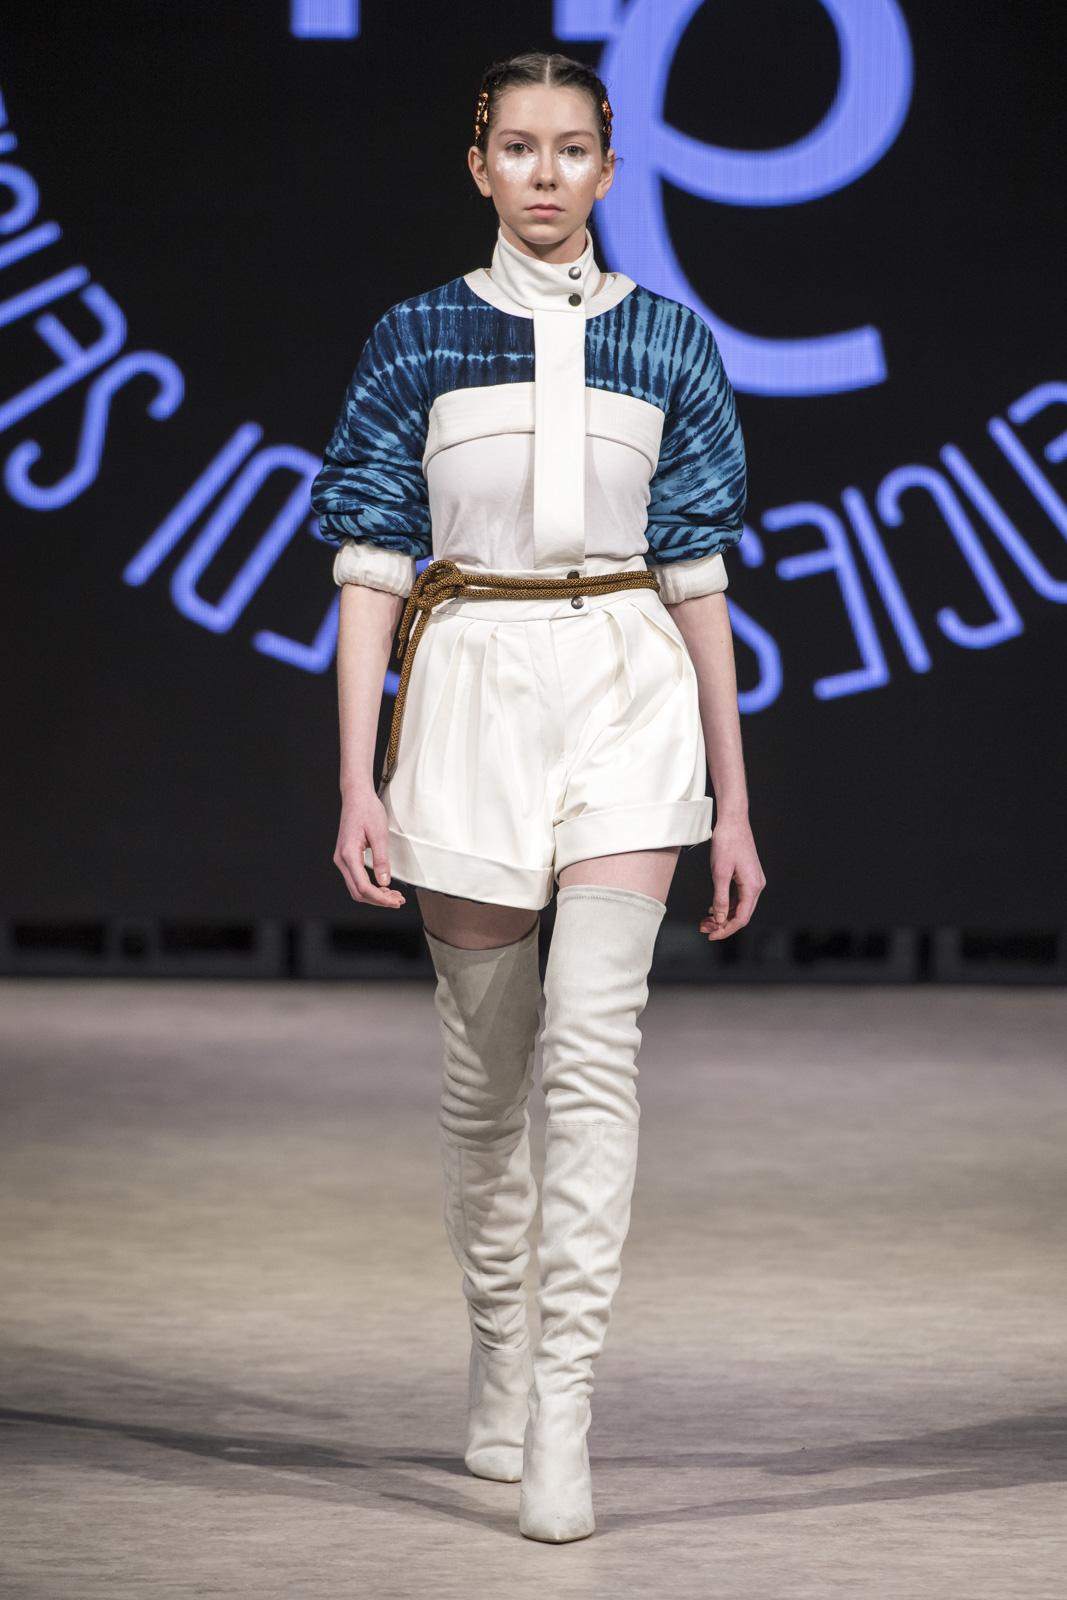 Mabu49 at Vancouver Fashion Week